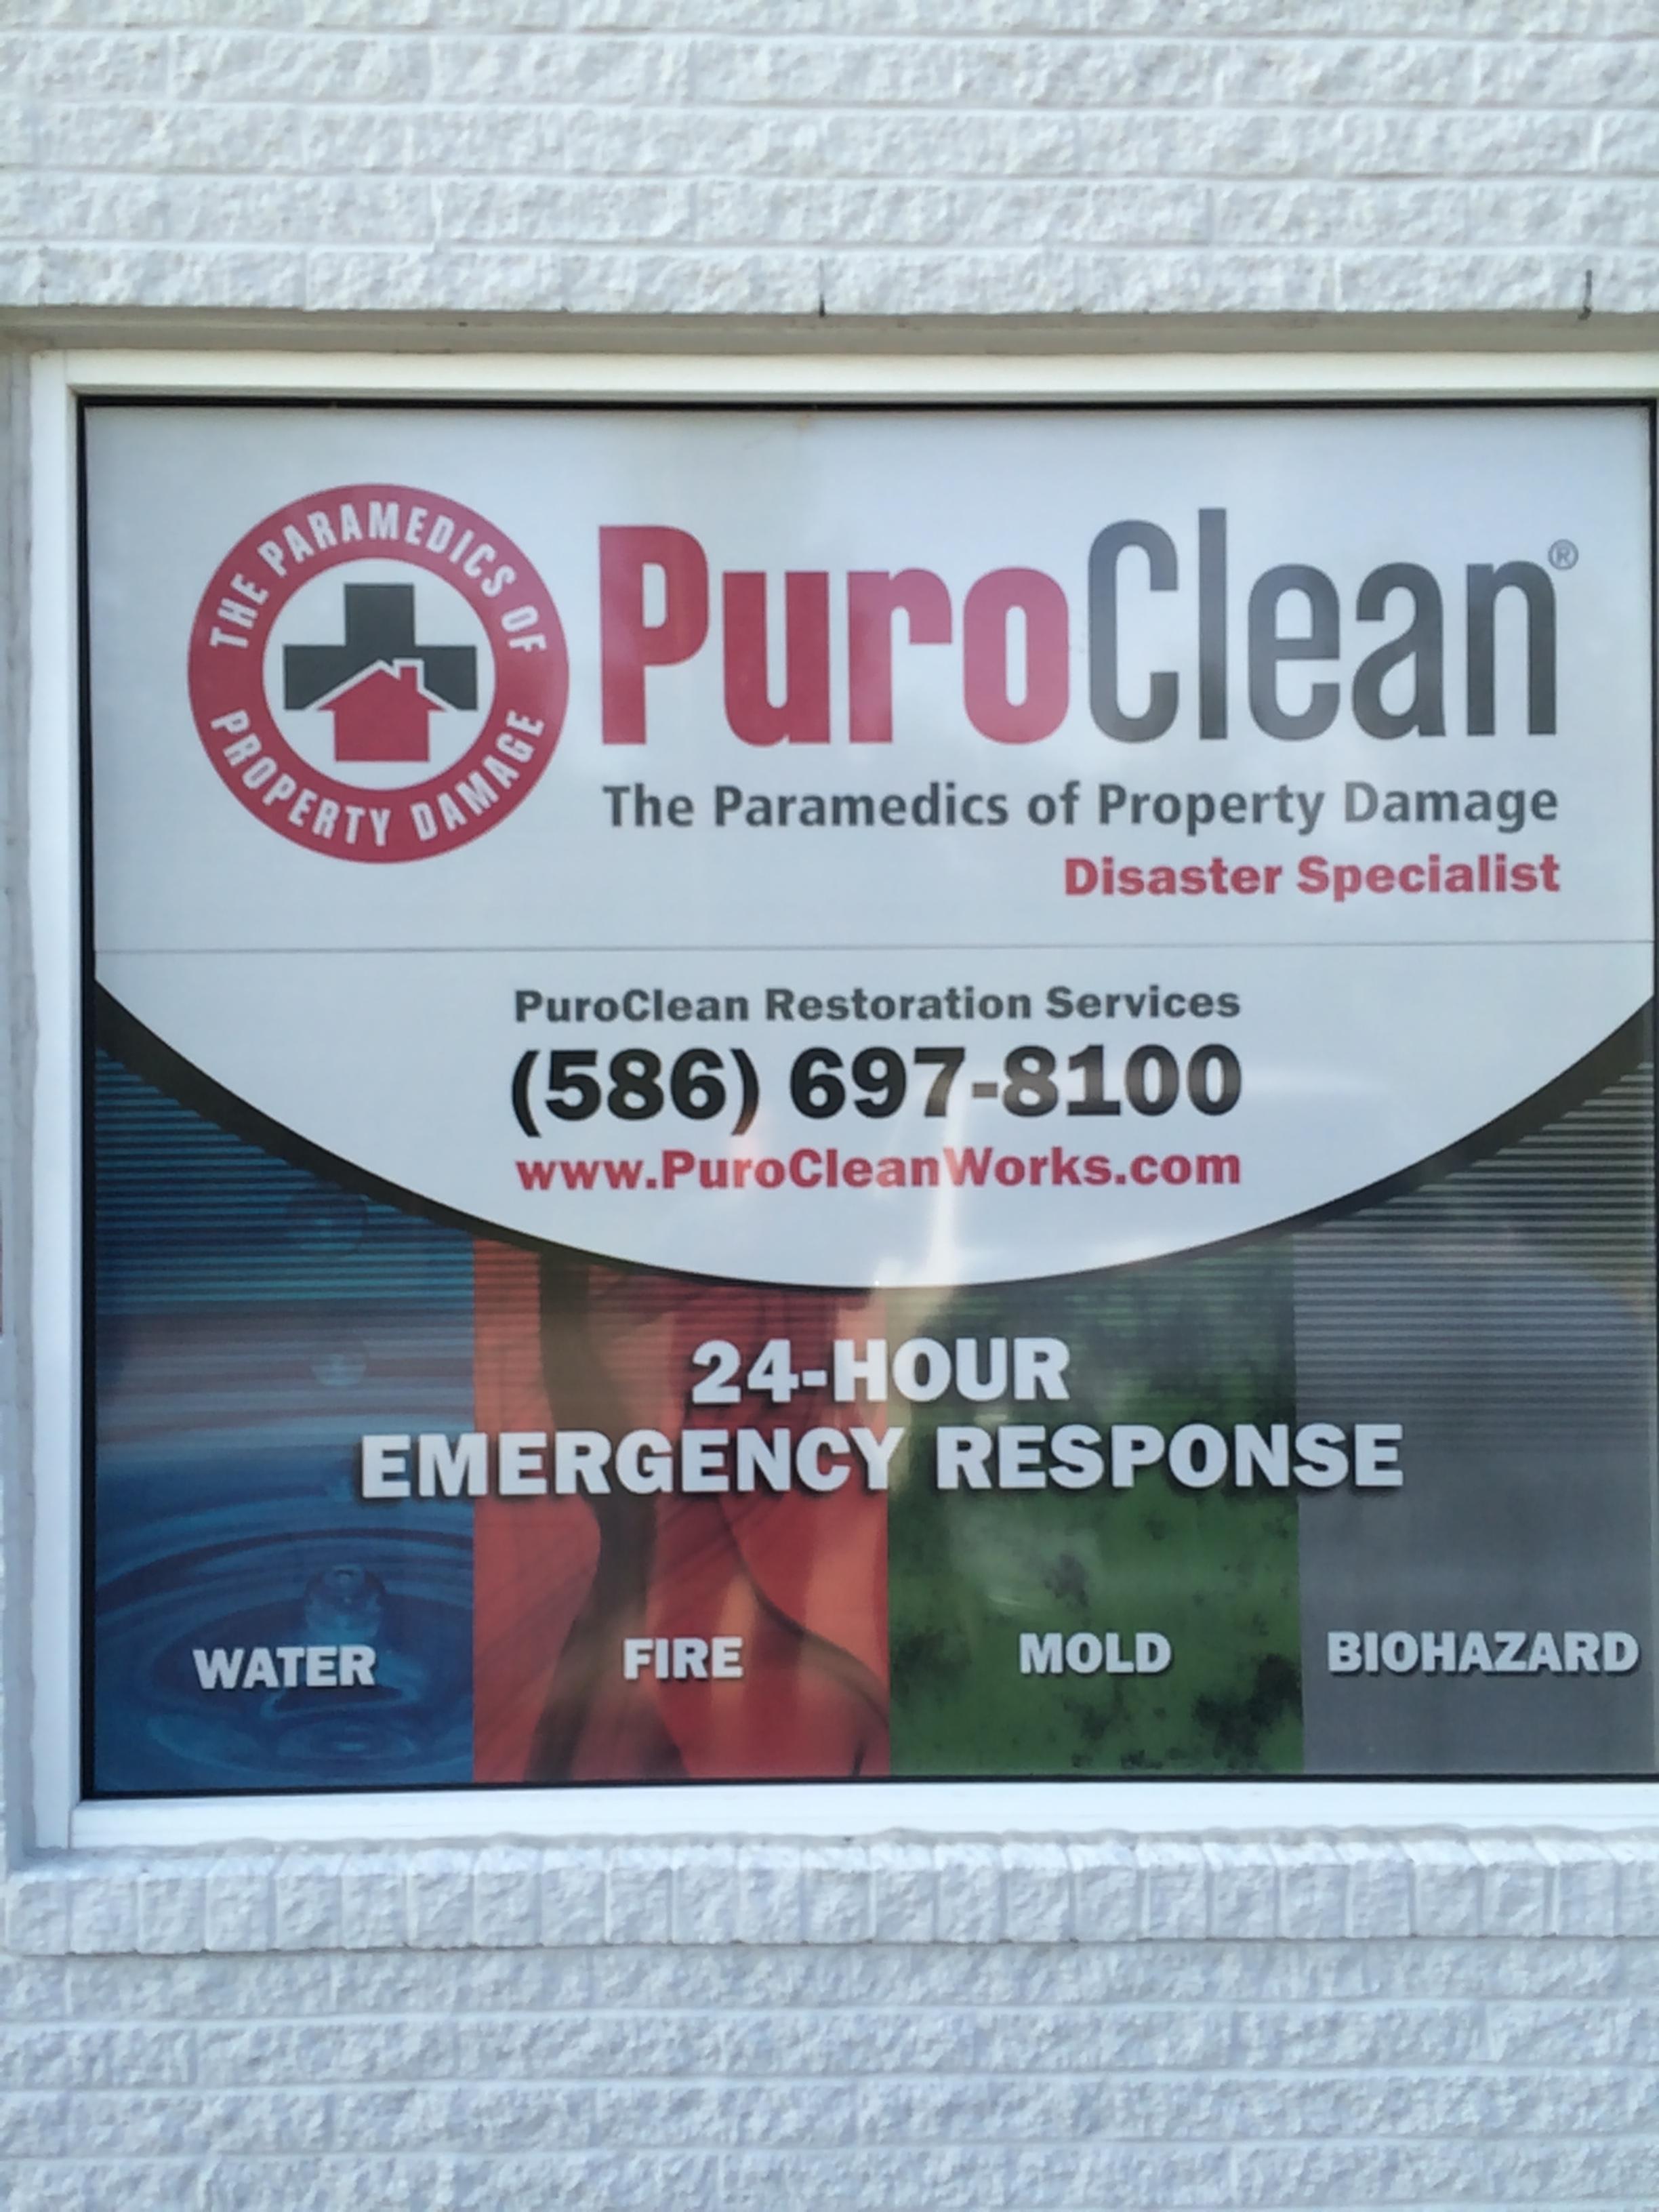 Puroclean Restoration Services image 0